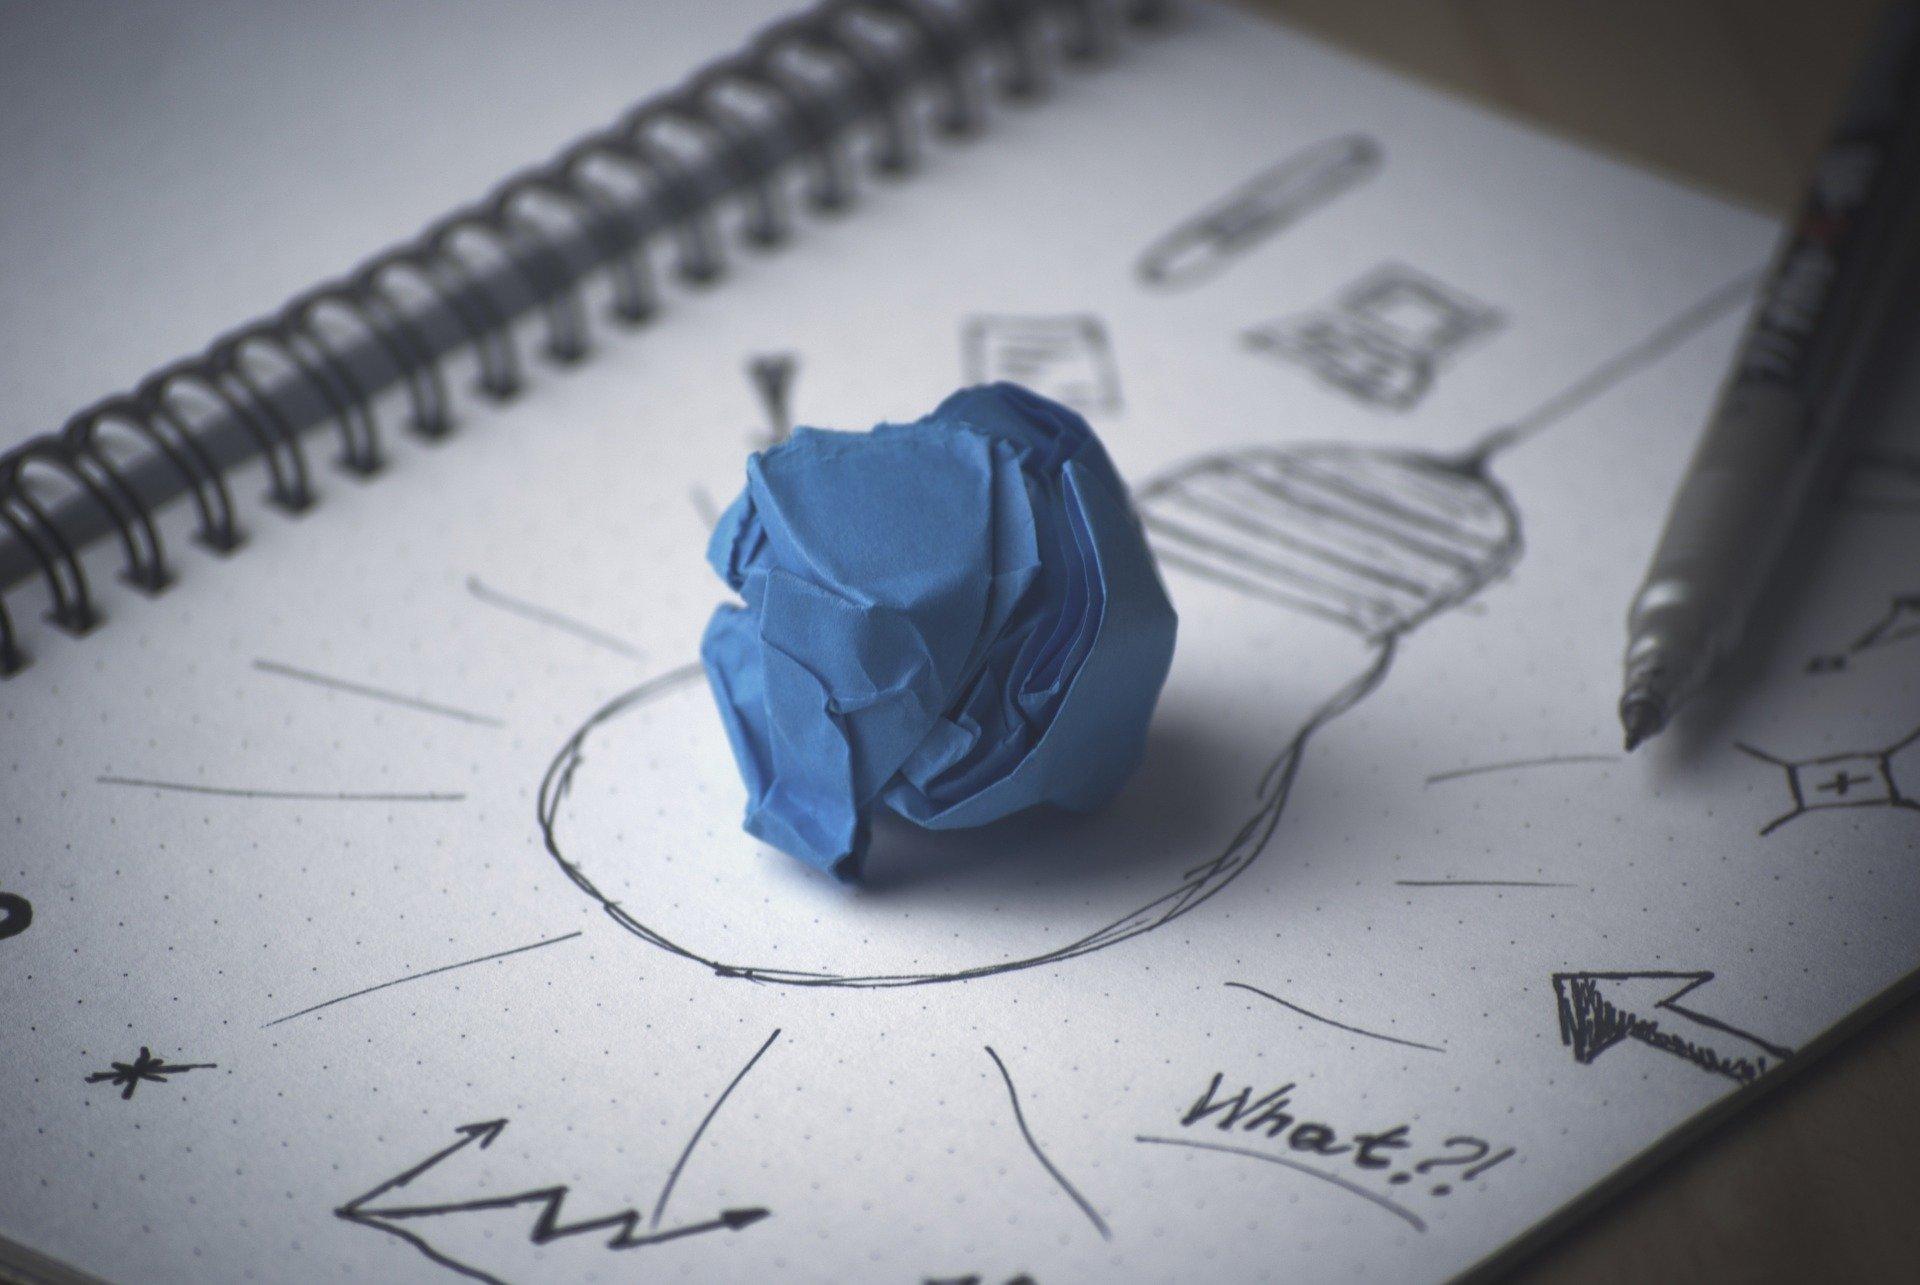 engineering creativity